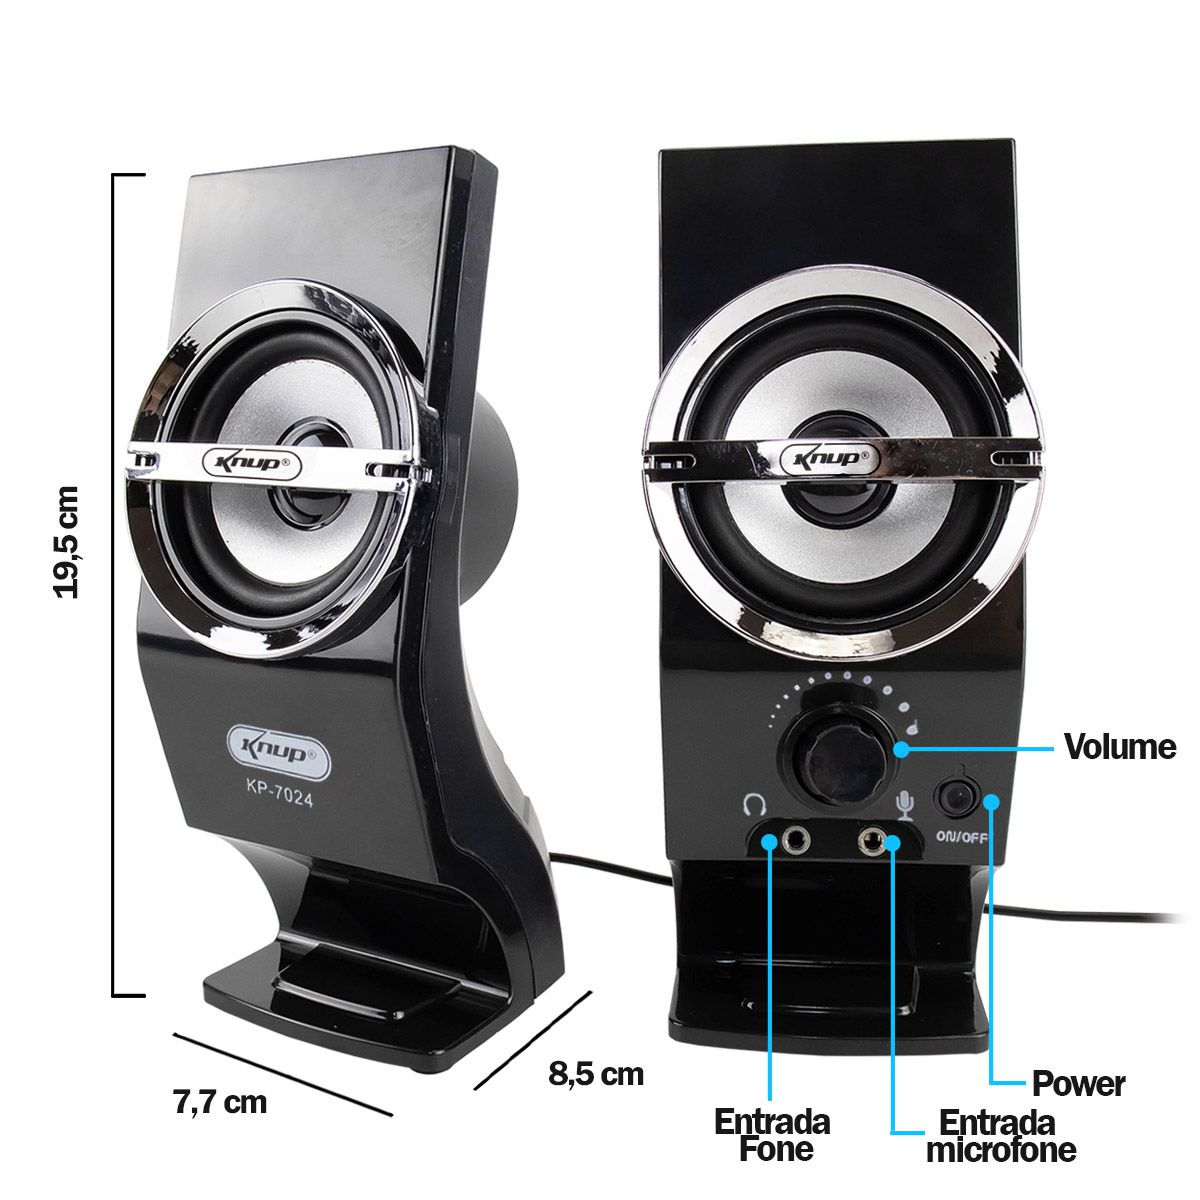 Caixa de Som 2.0 de 12 Watts Rms para PC Knup KP-7024